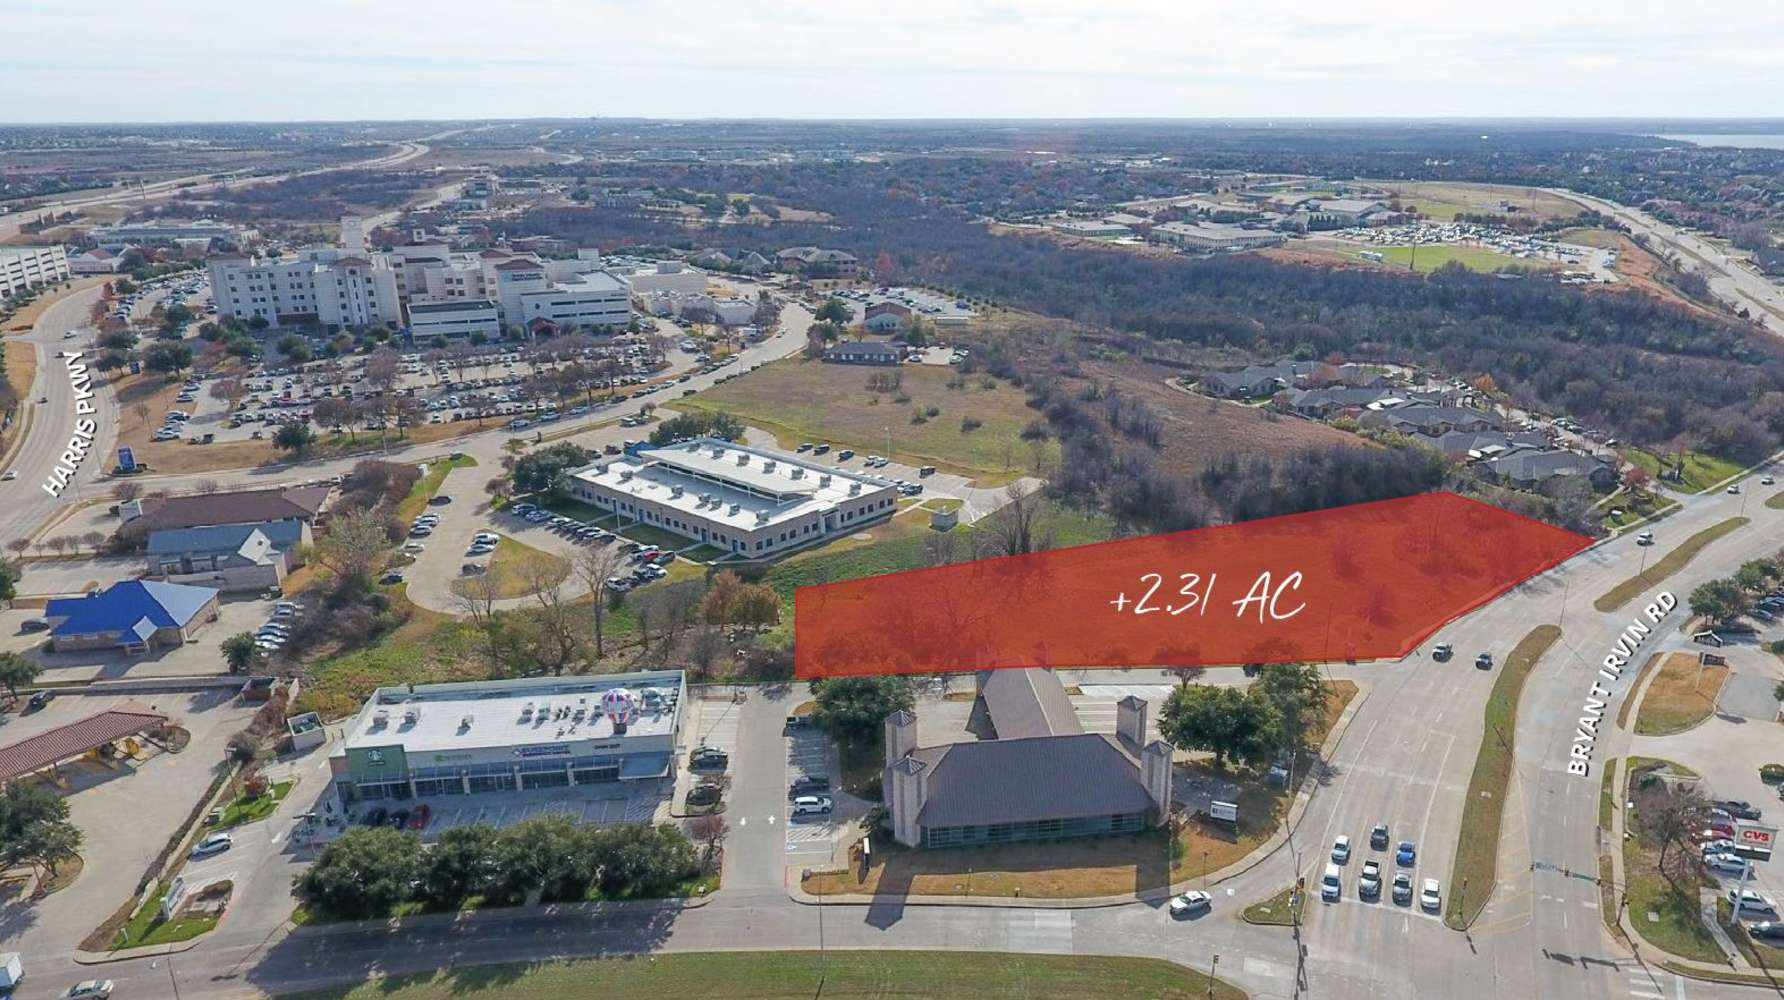 Land Fort worth, 76132 - 6021 Bryant Irvin Rd